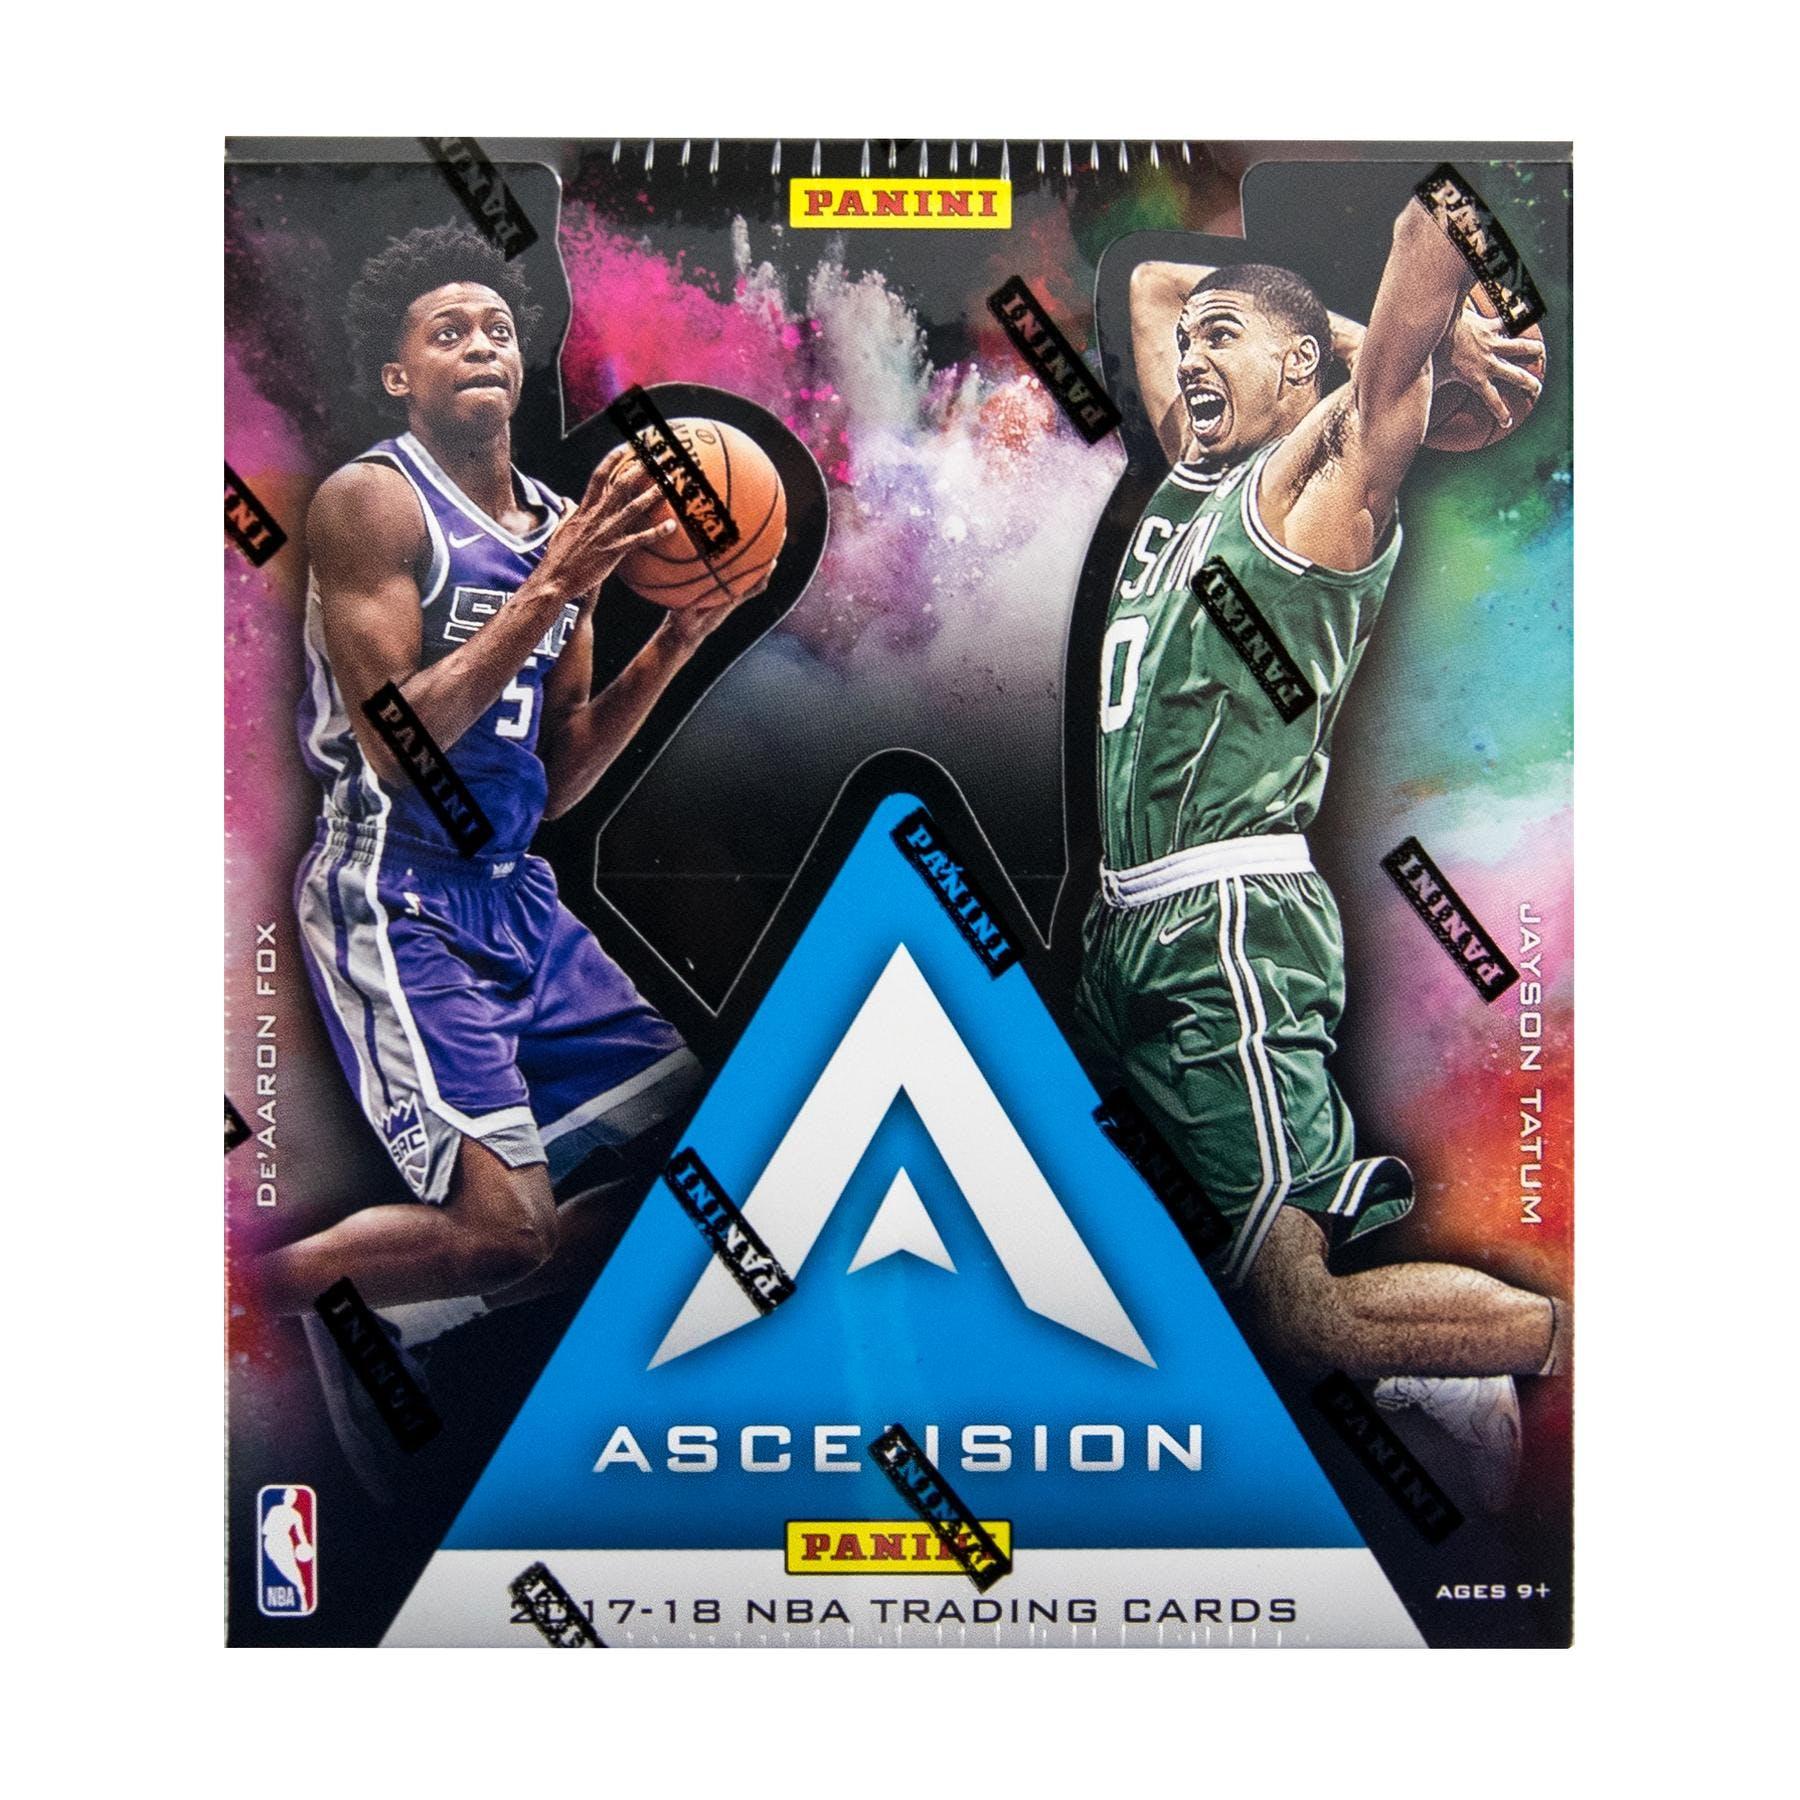 d46bbb77660 2017 18 Panini Ascension Basketball Hobby Box